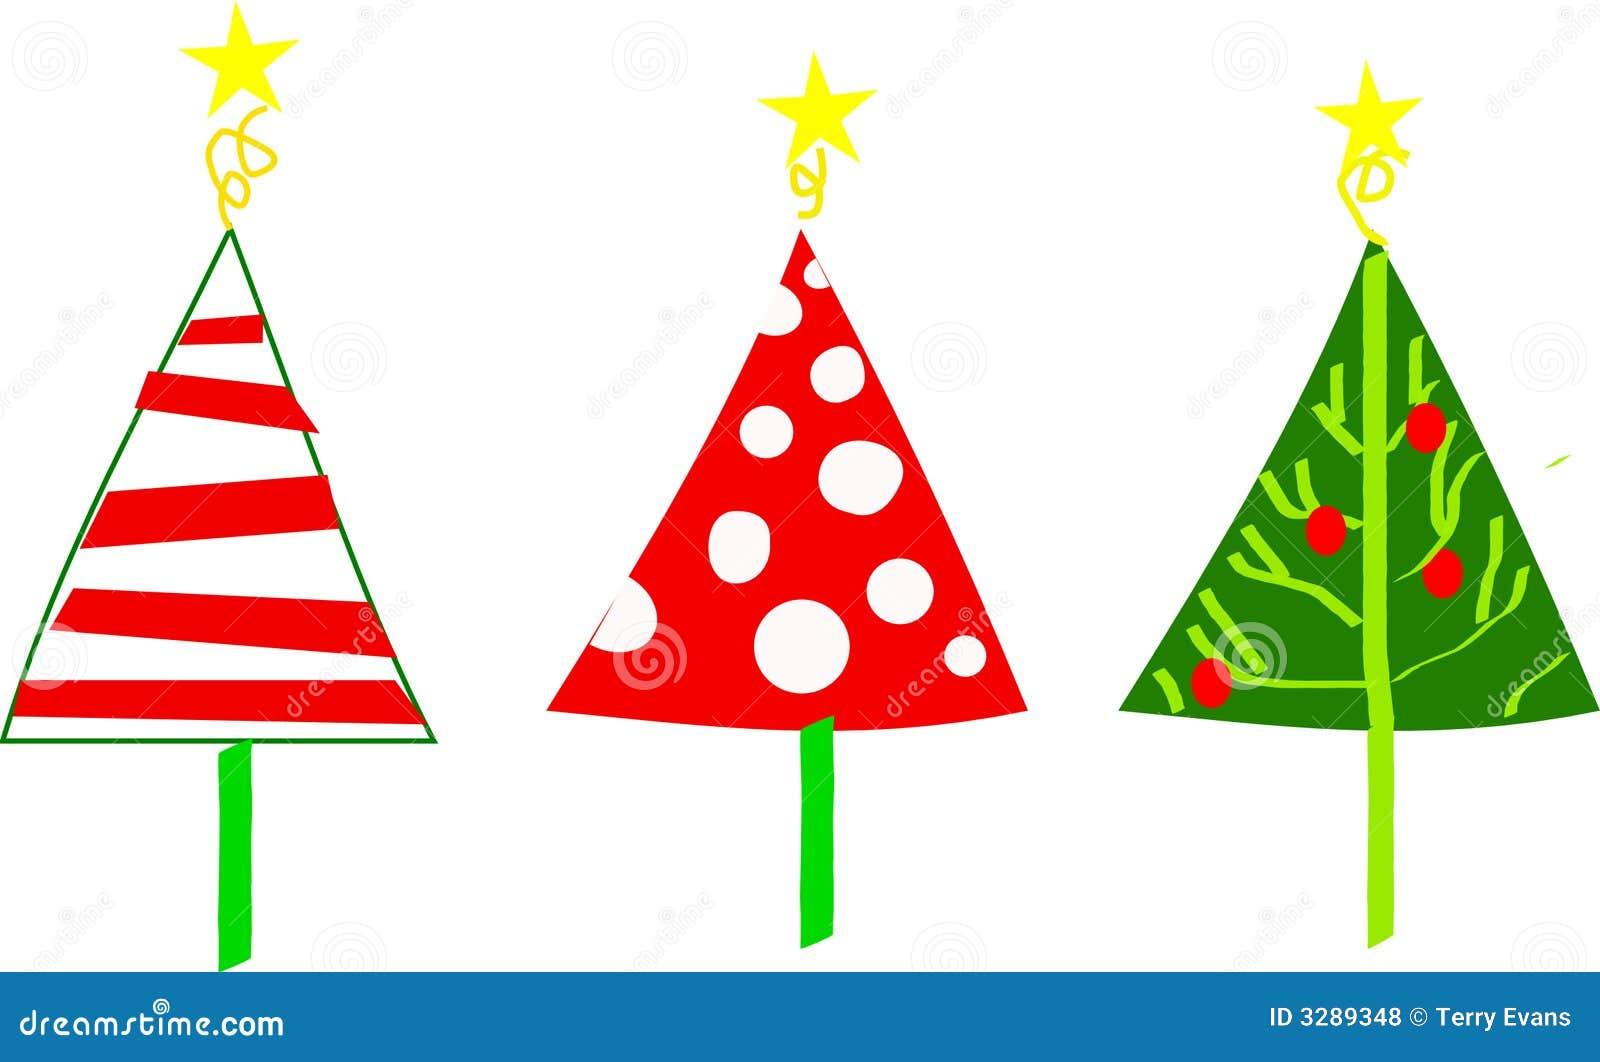 whimsical christmas tree clip art free - photo #9